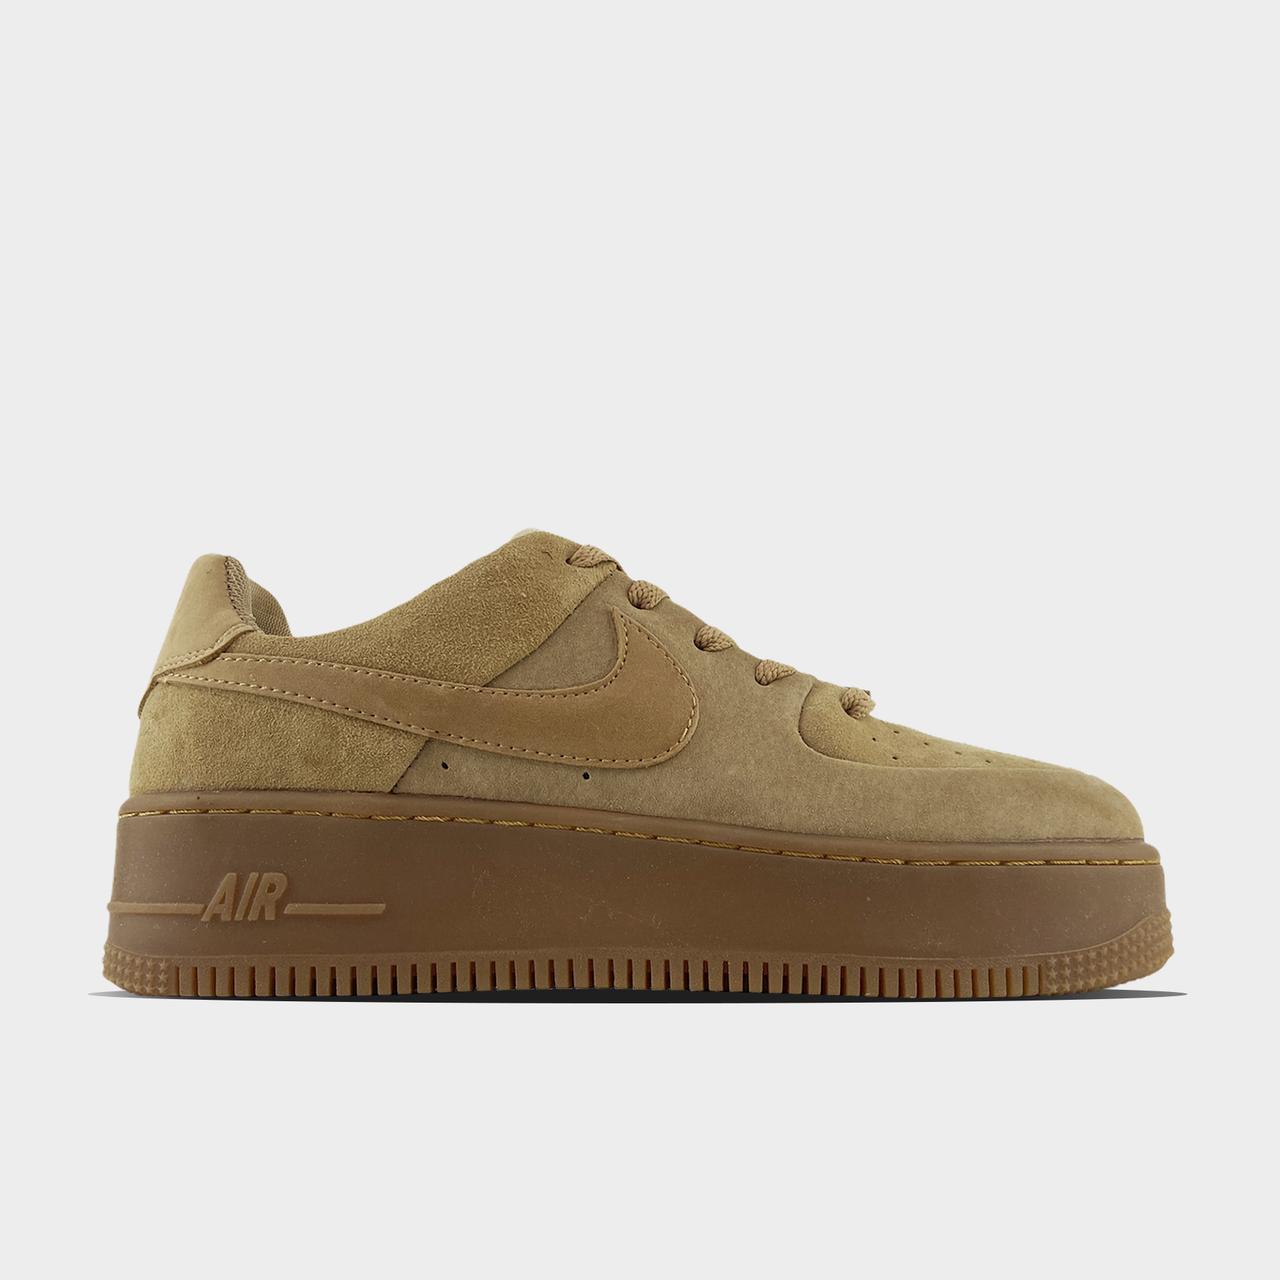 Nk, крос, обувь, взуття, sneakers, шузы, Air Force 1 Sage Low Club Gold (Коричневый)37,38,39